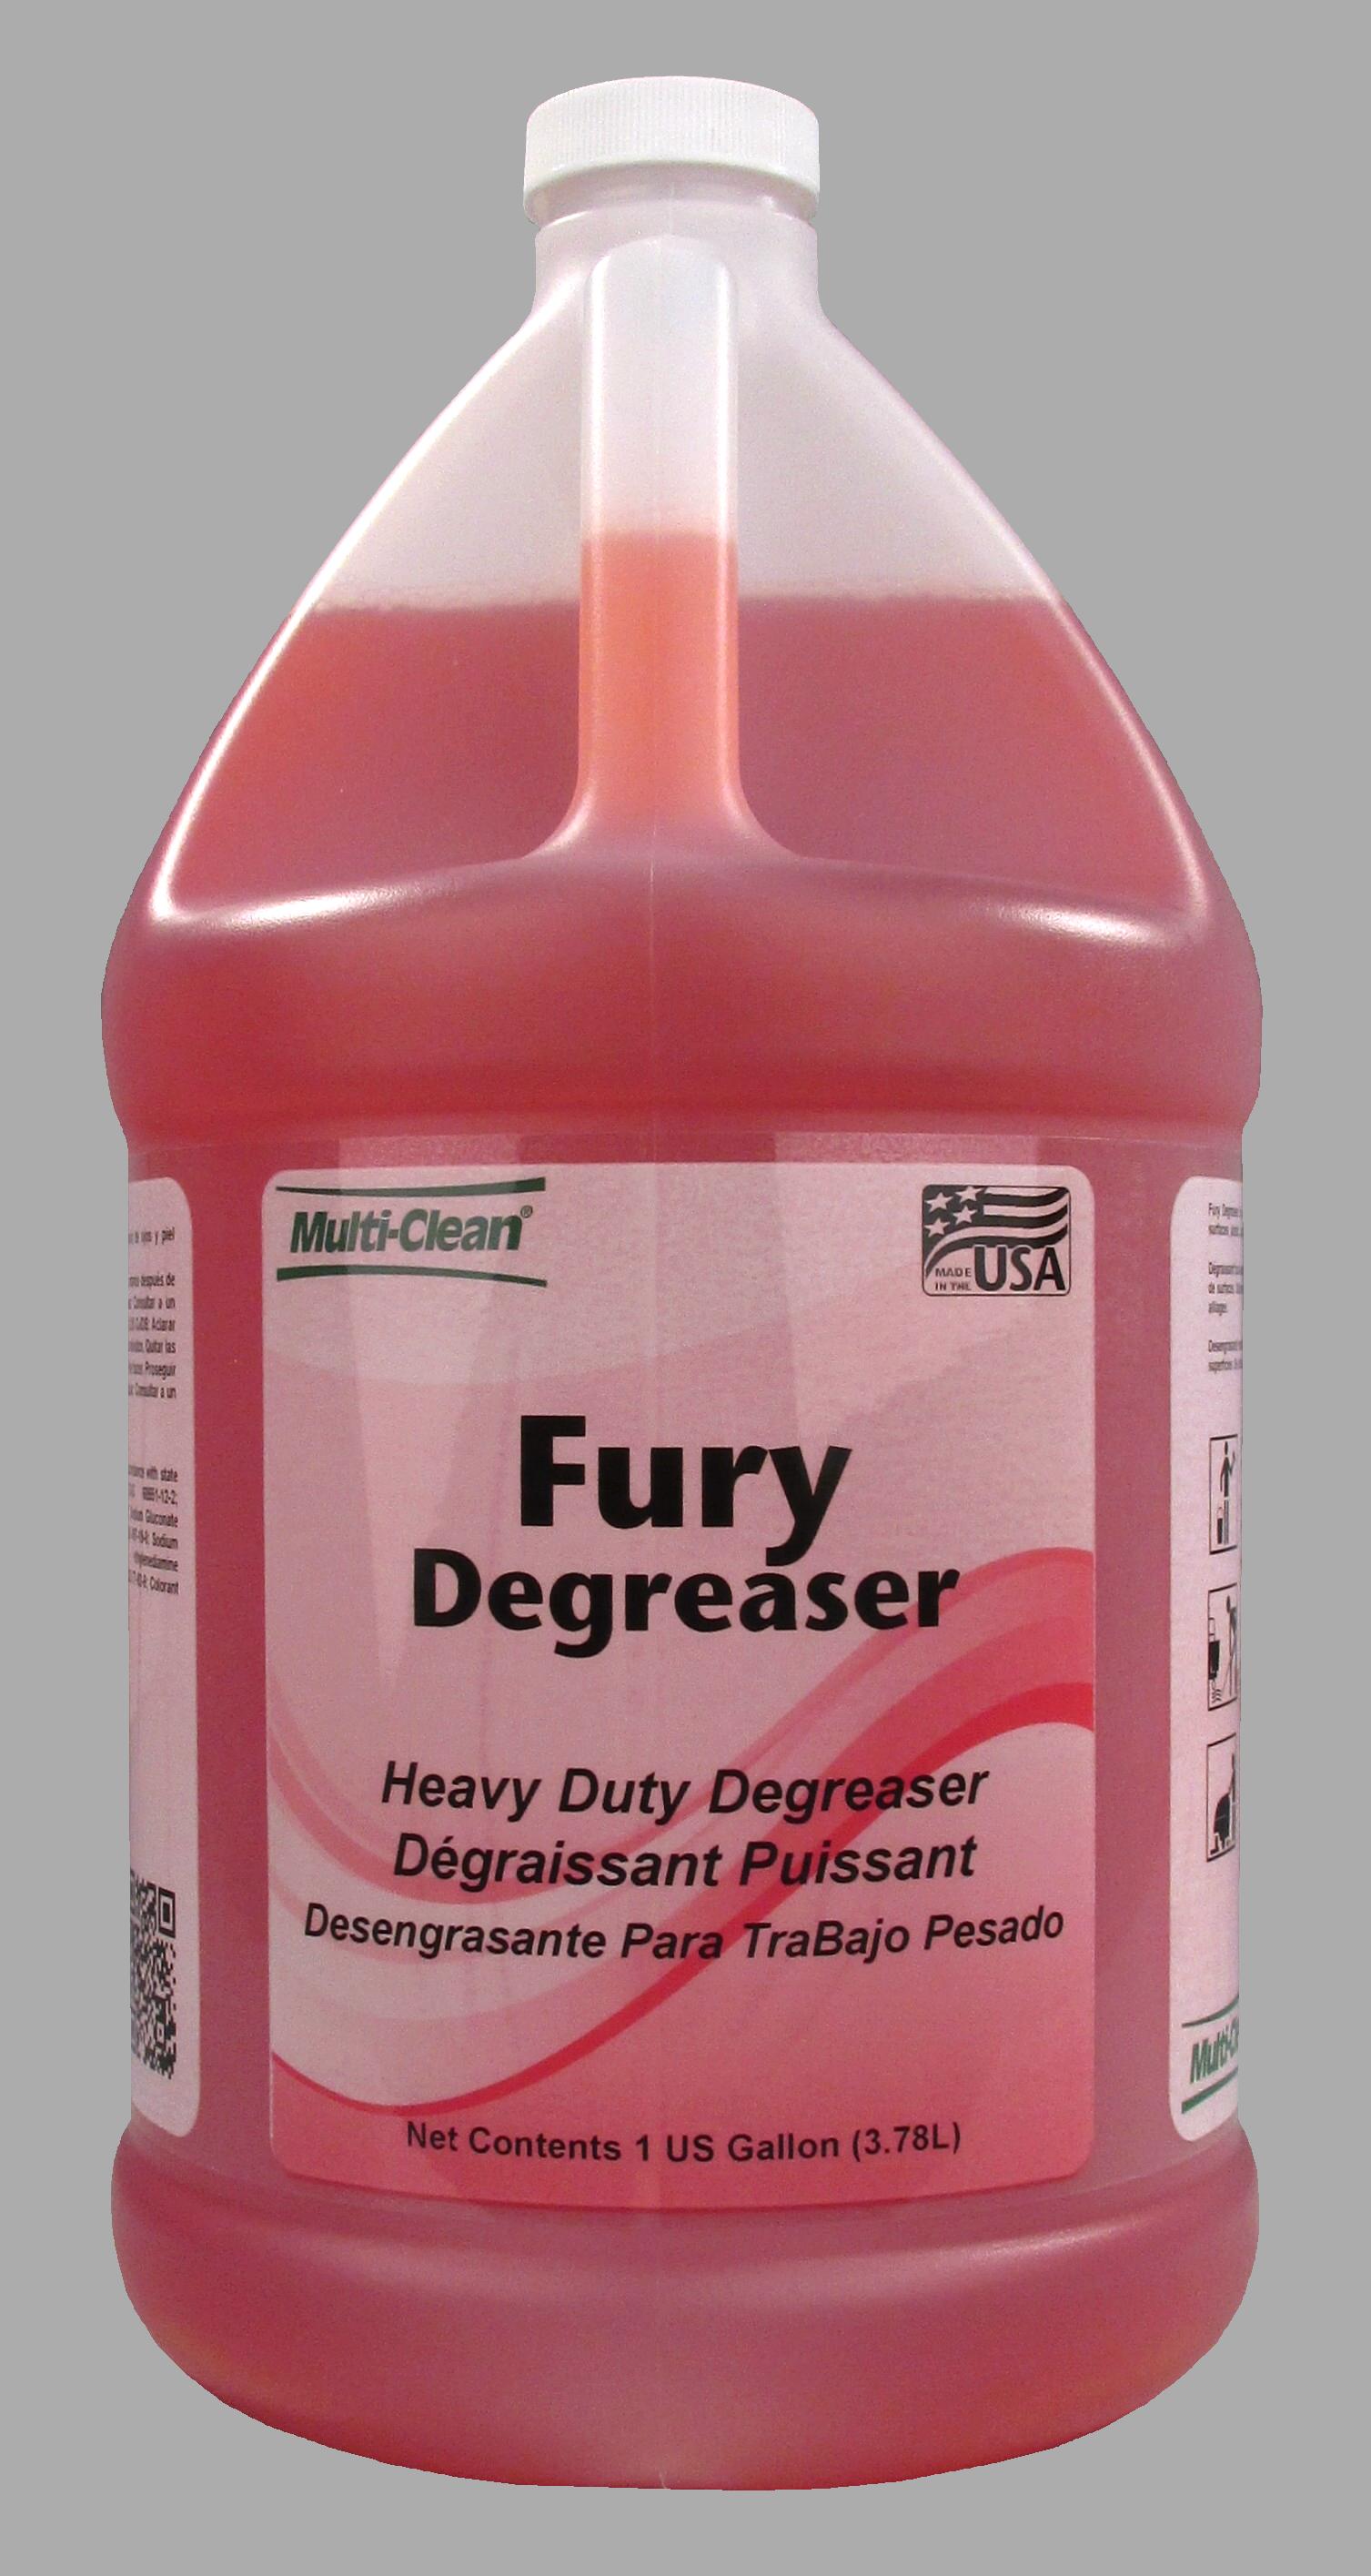 Fury Degreaser